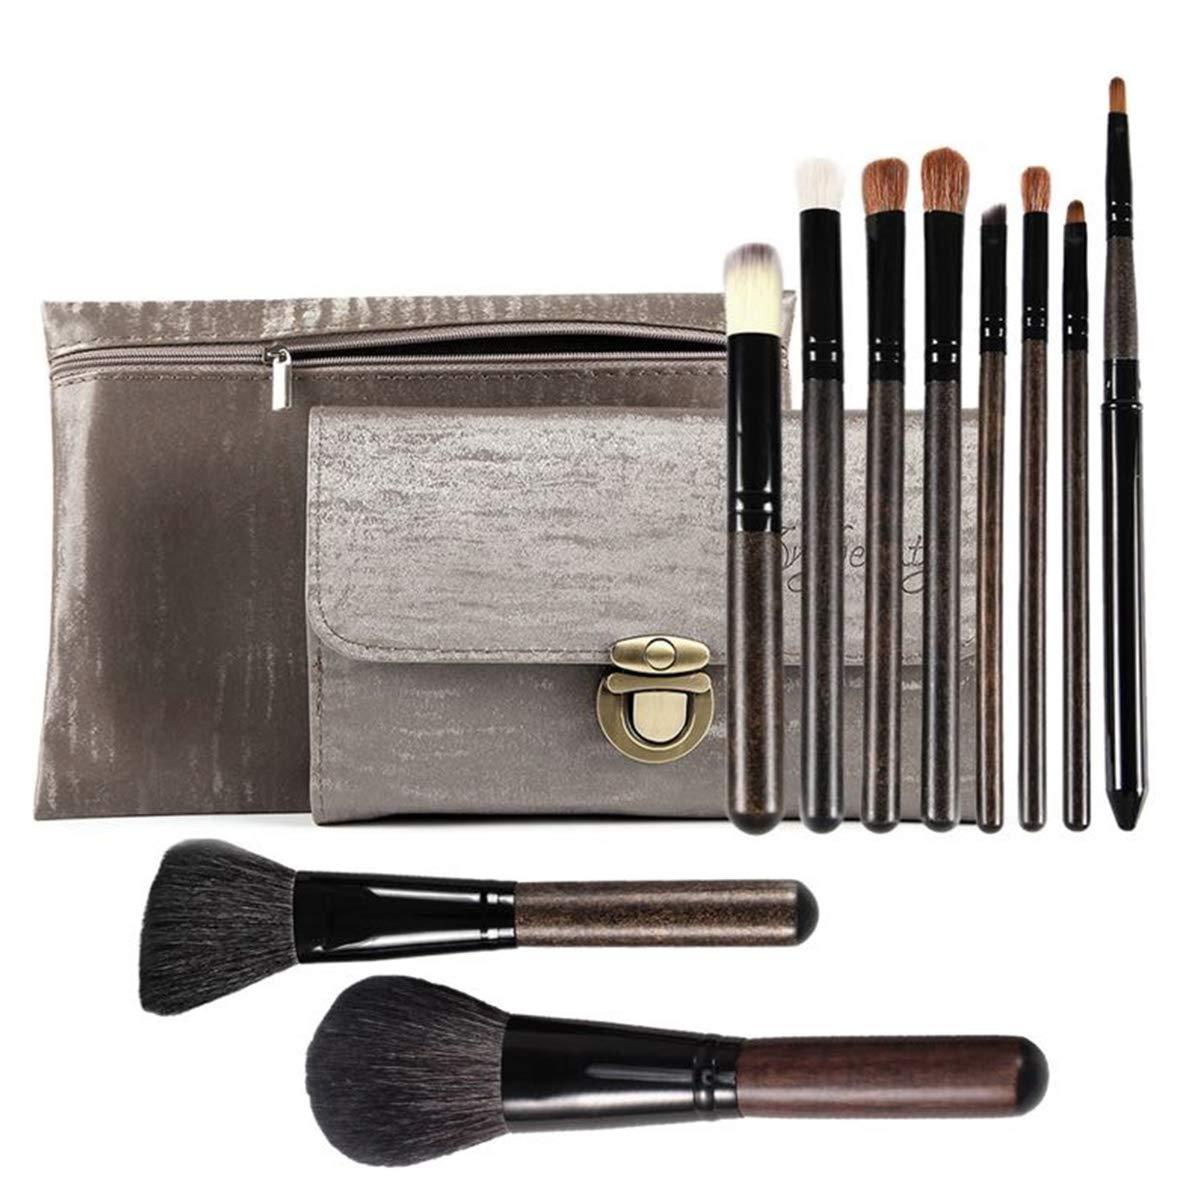 Goat Hair Makeup Brushes 10PCS Soft Professional Makeup Brush Set Foundation Blush Eye Shadow Makeup Brushes Two PU Cosmetic Bags JYNLU (goat hair) (goat hair)